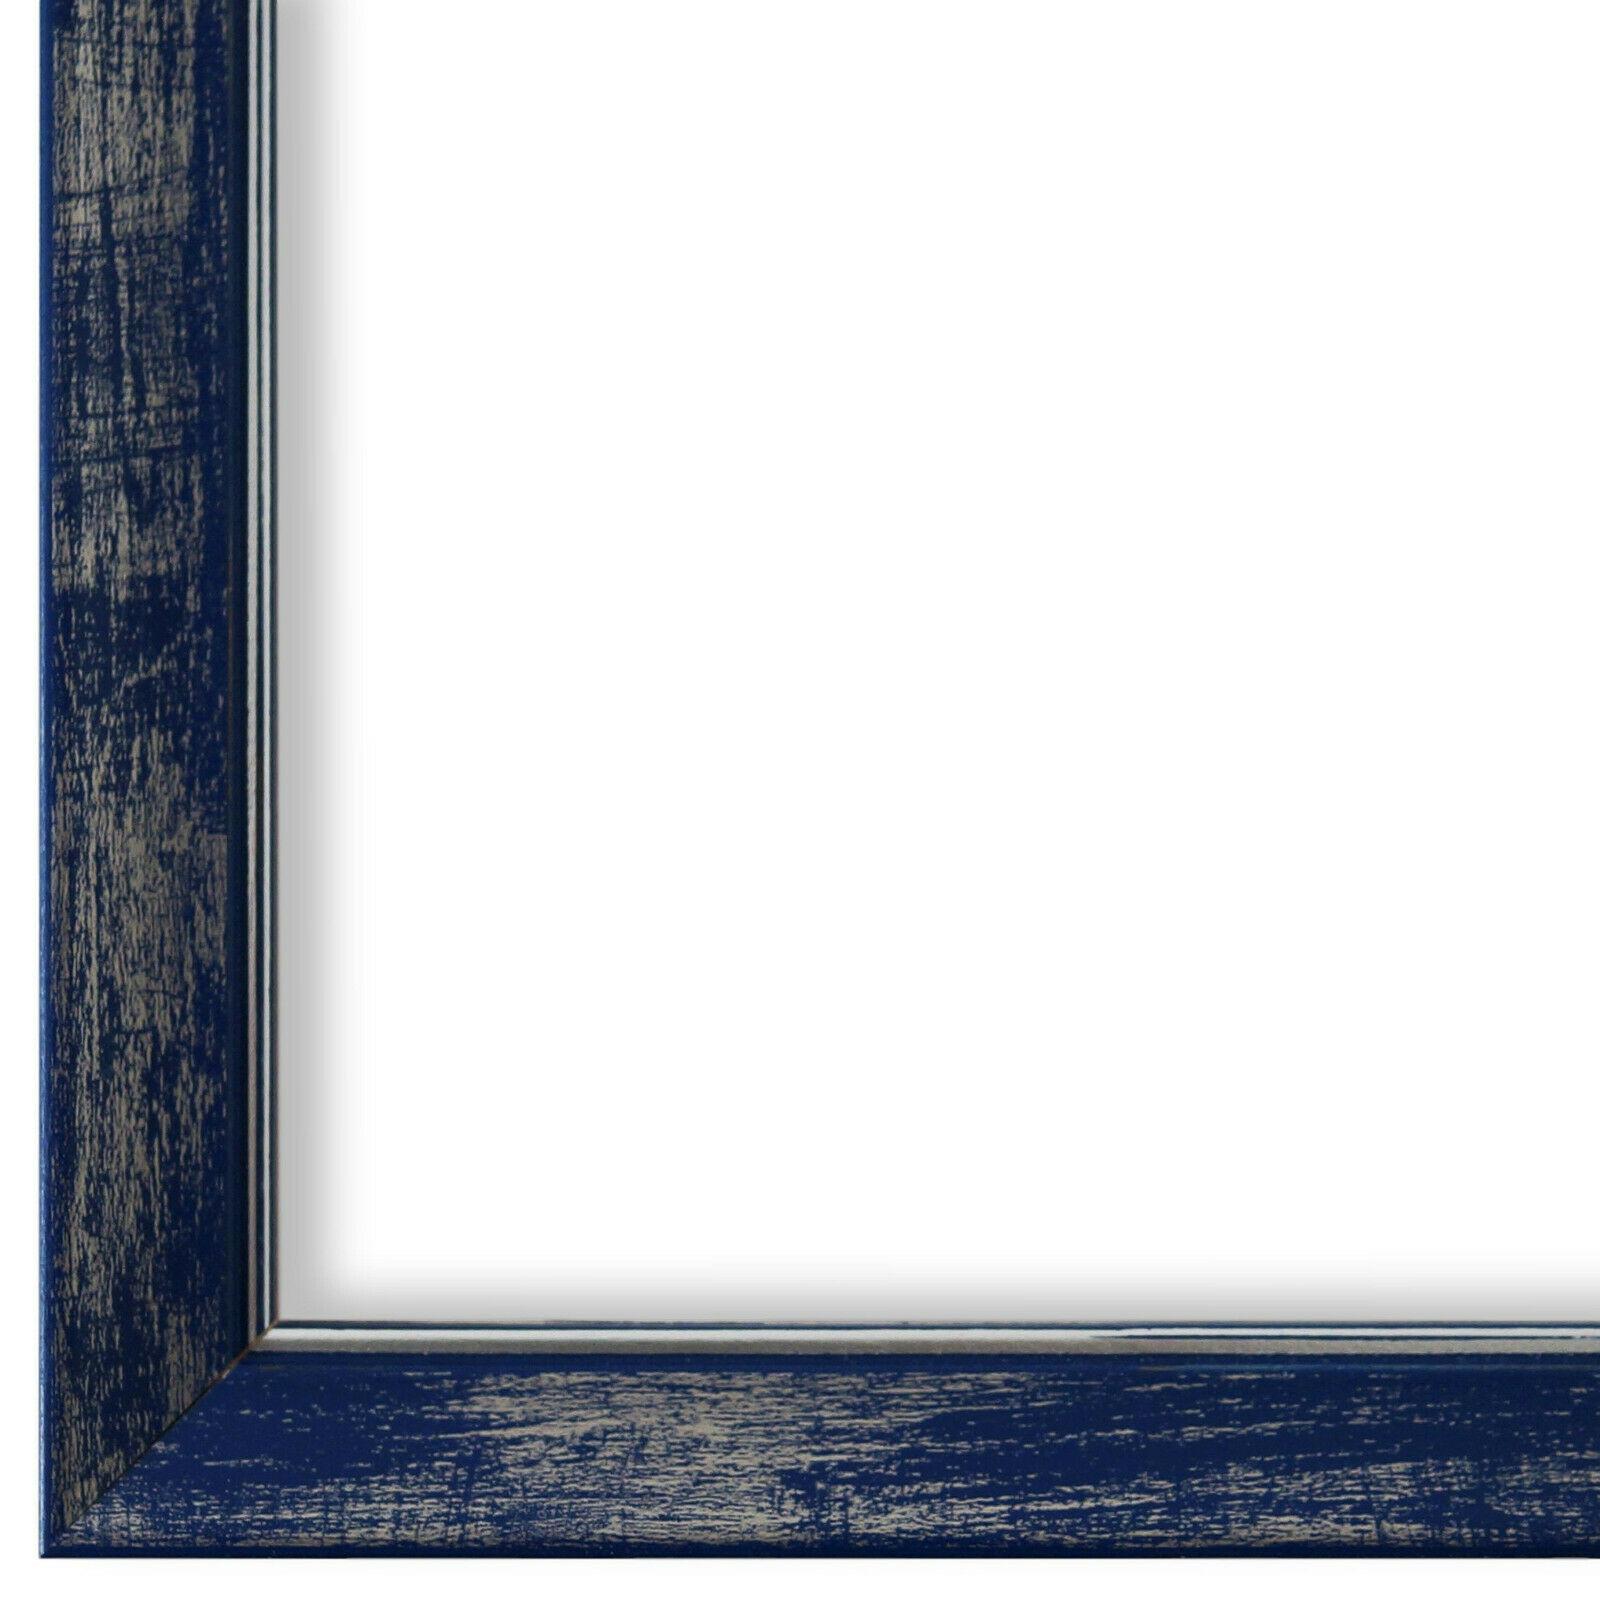 Bilderrahmen Weiss Silber Frosinone 1,8-40x40 40x50 40x60 50x50 50x60 60x60